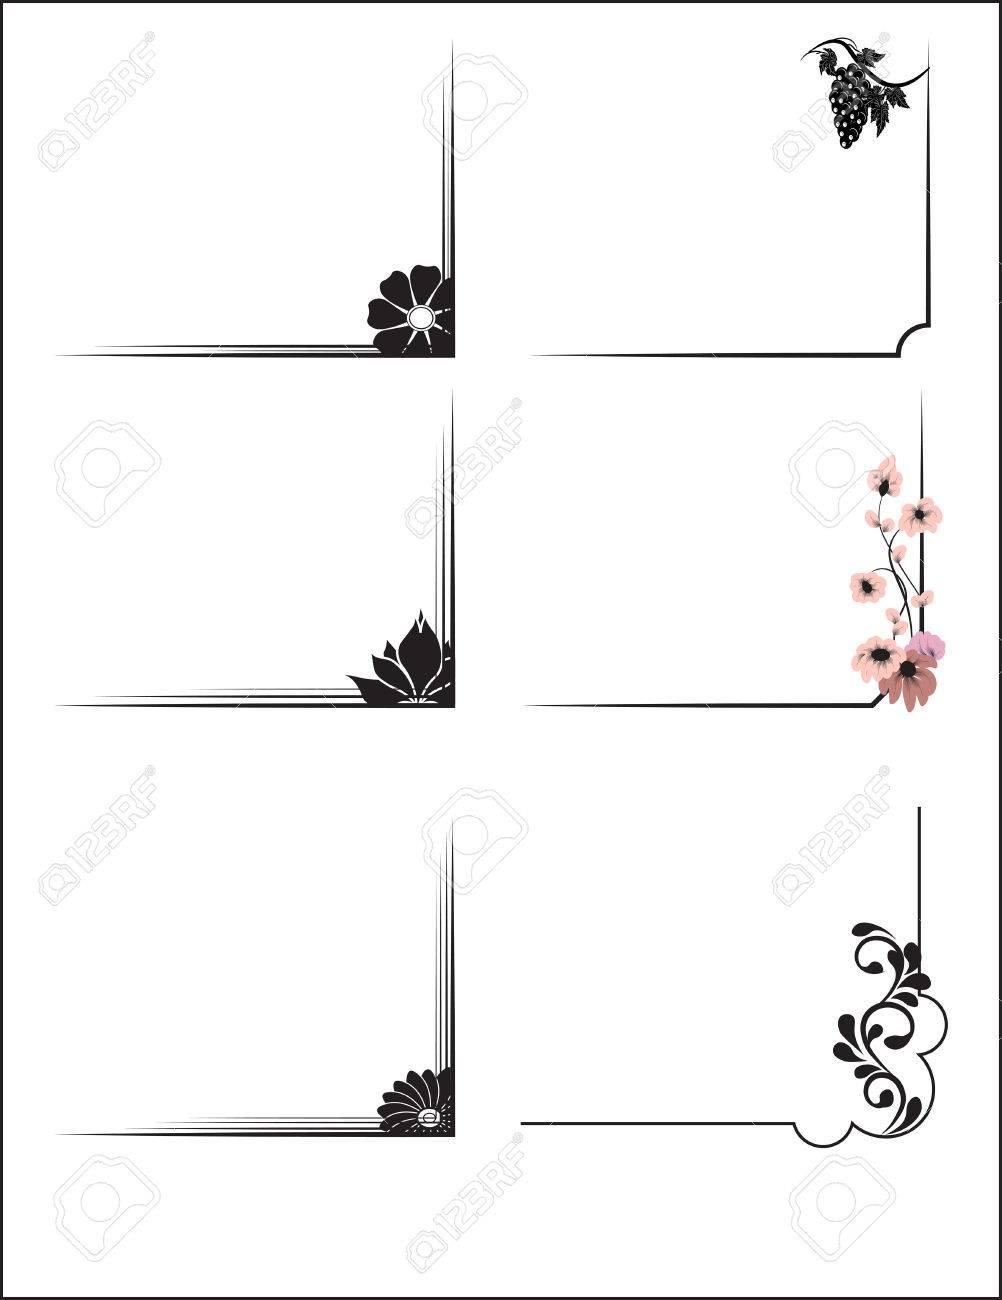 Hte Flower Frame, Corners, Shadings For A Framework Royalty Free ...